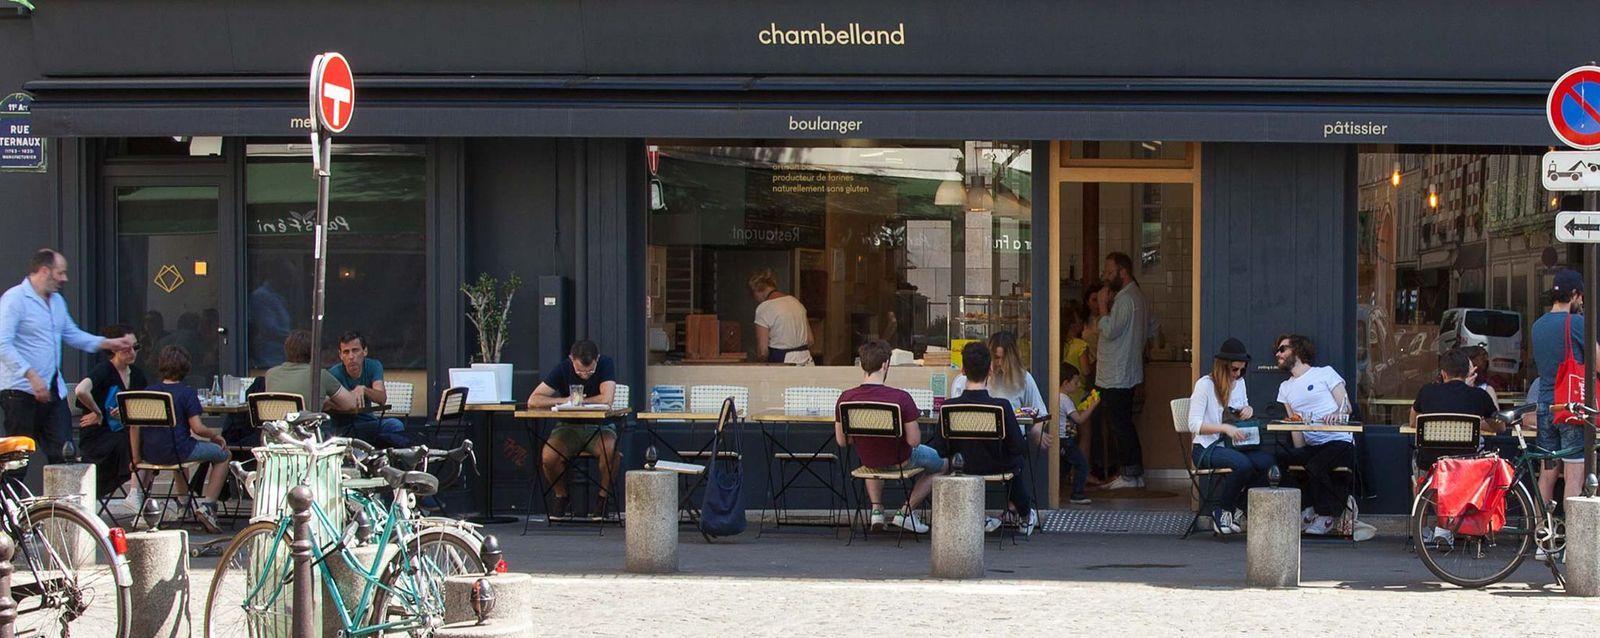 les boutiques Chambelland